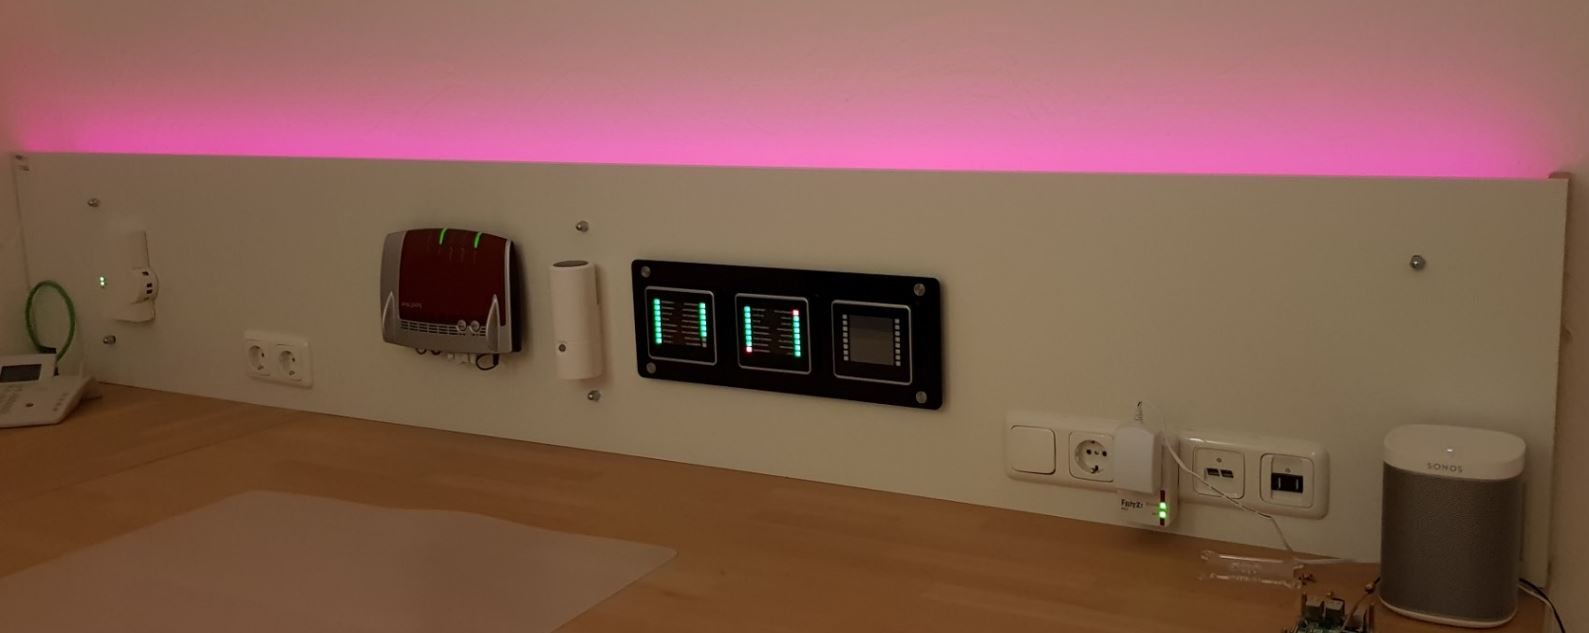 Homematic Praxis - RGBW Controller - Indirekte Beleuchtung, Status der Alarmanlage